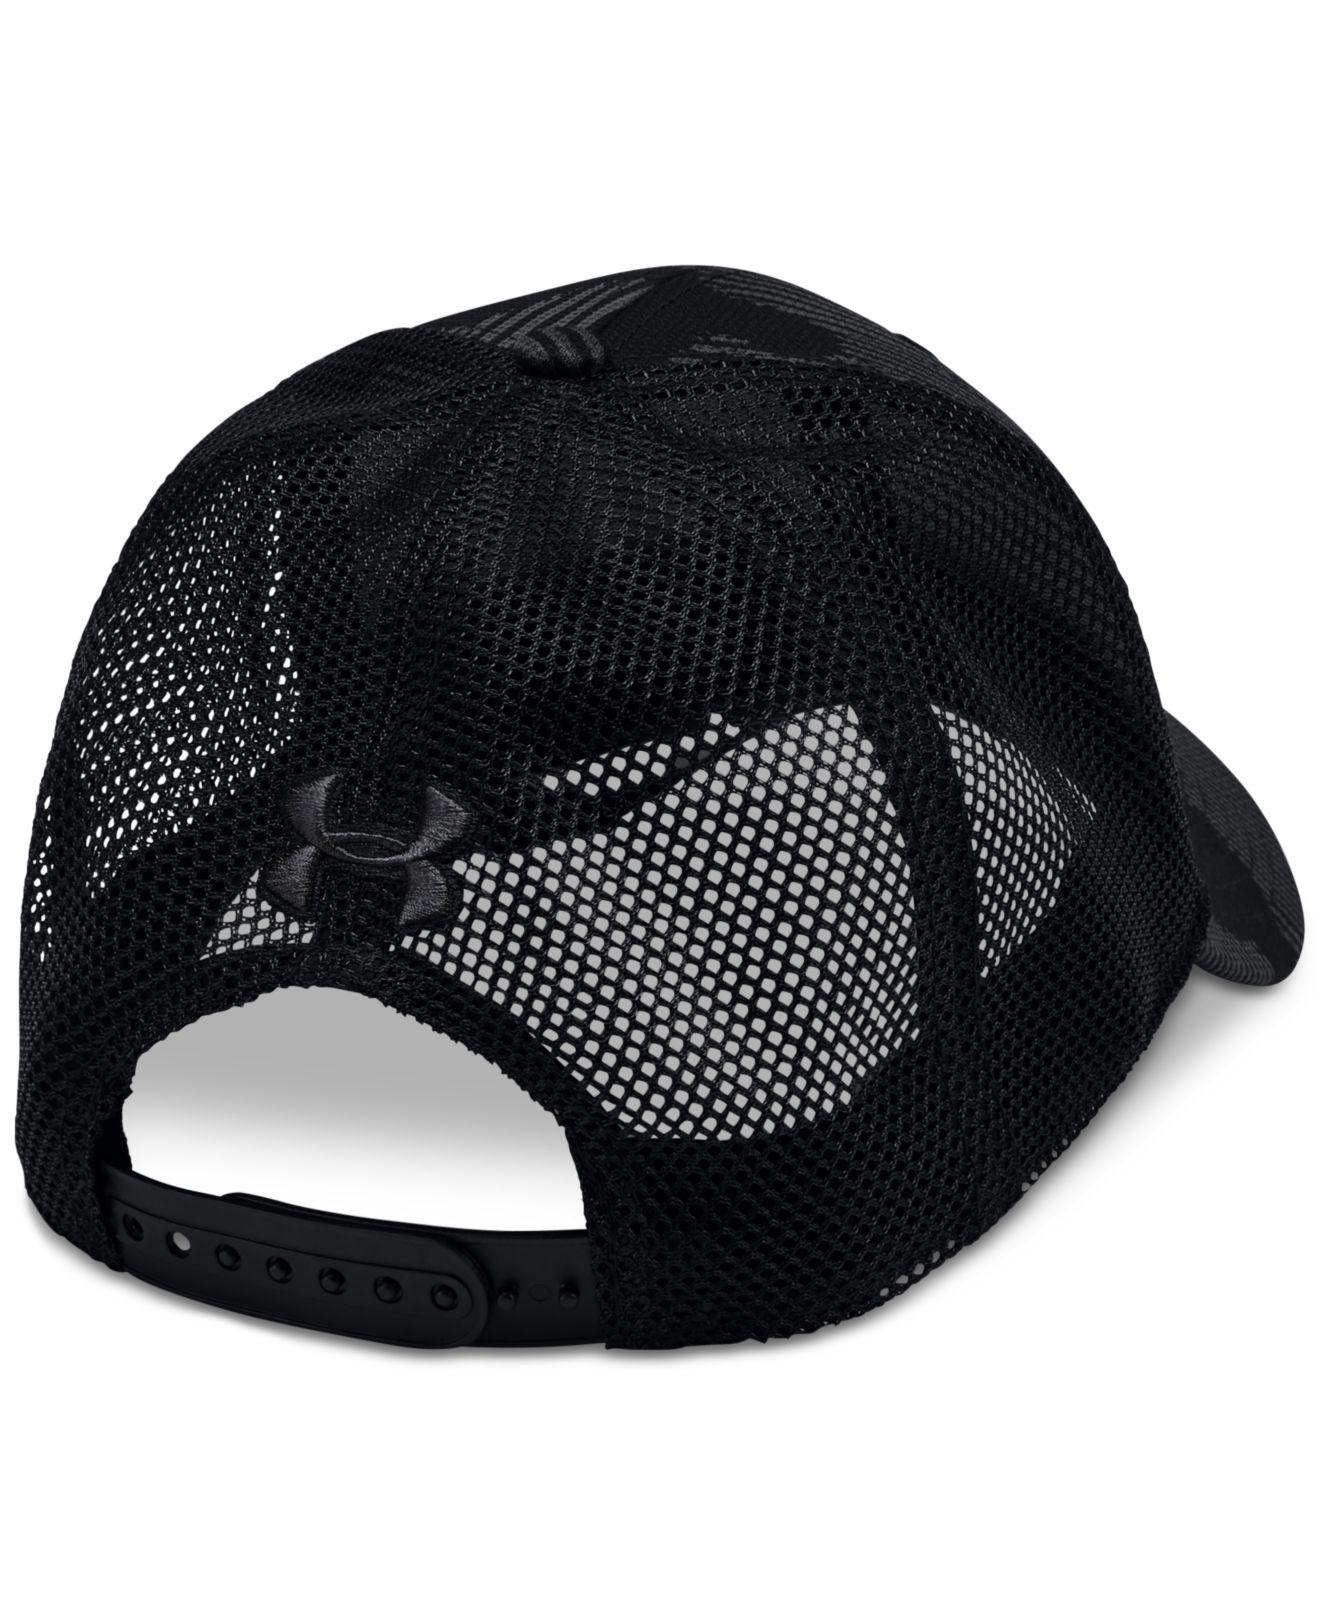 c096c549c Under Armour Ua Pro Printed Trucker Hat in Black for Men - Lyst